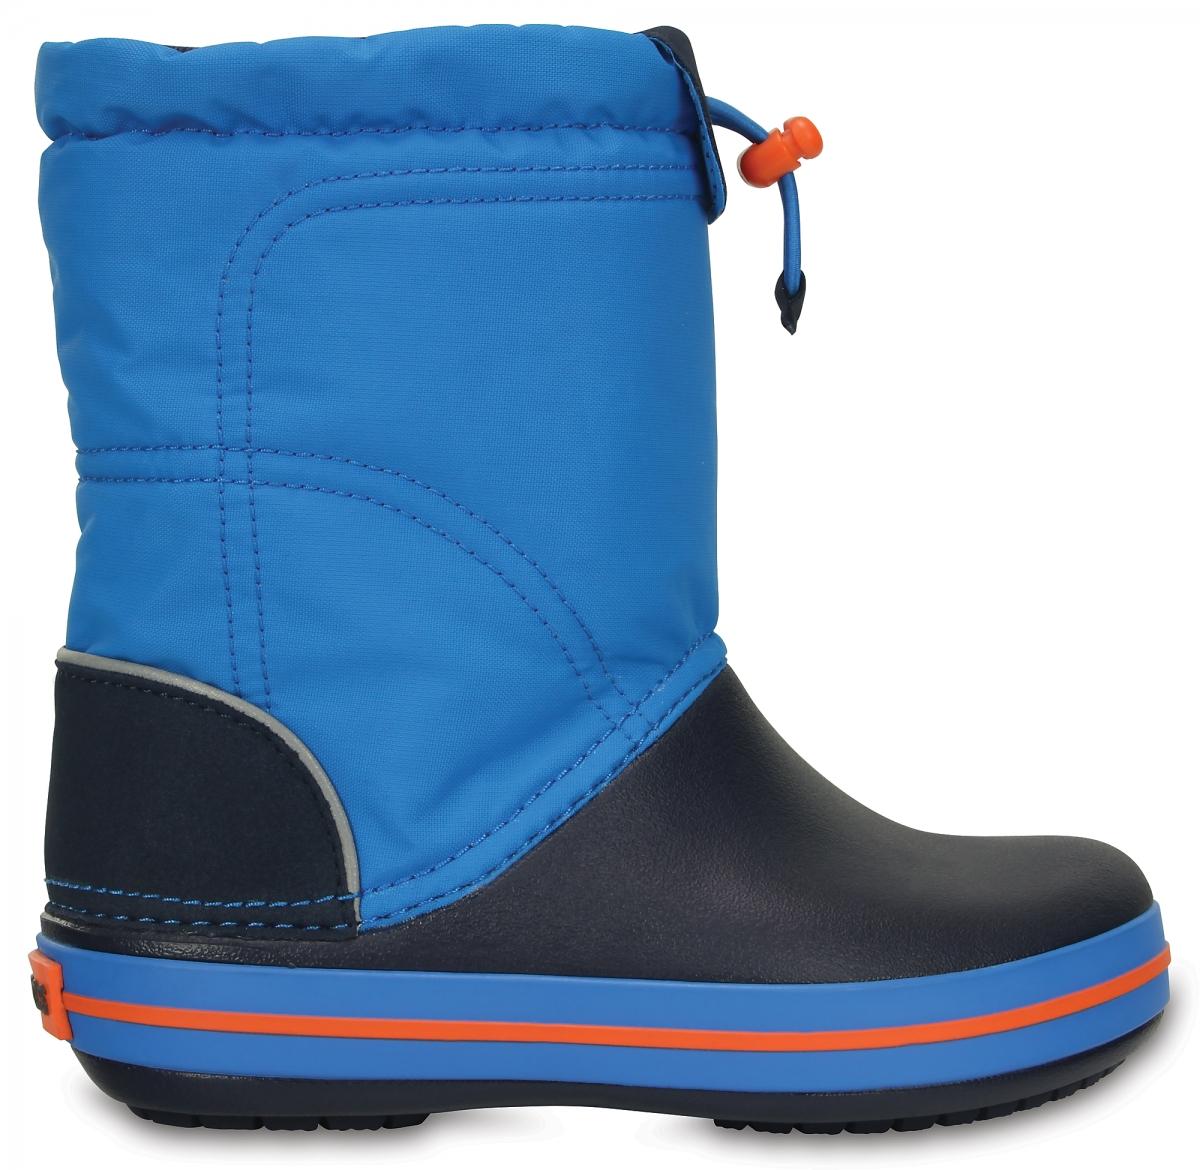 Crocs Crocband LodgePoint Boot Kids Ocean/Navy, J1 (32-33)